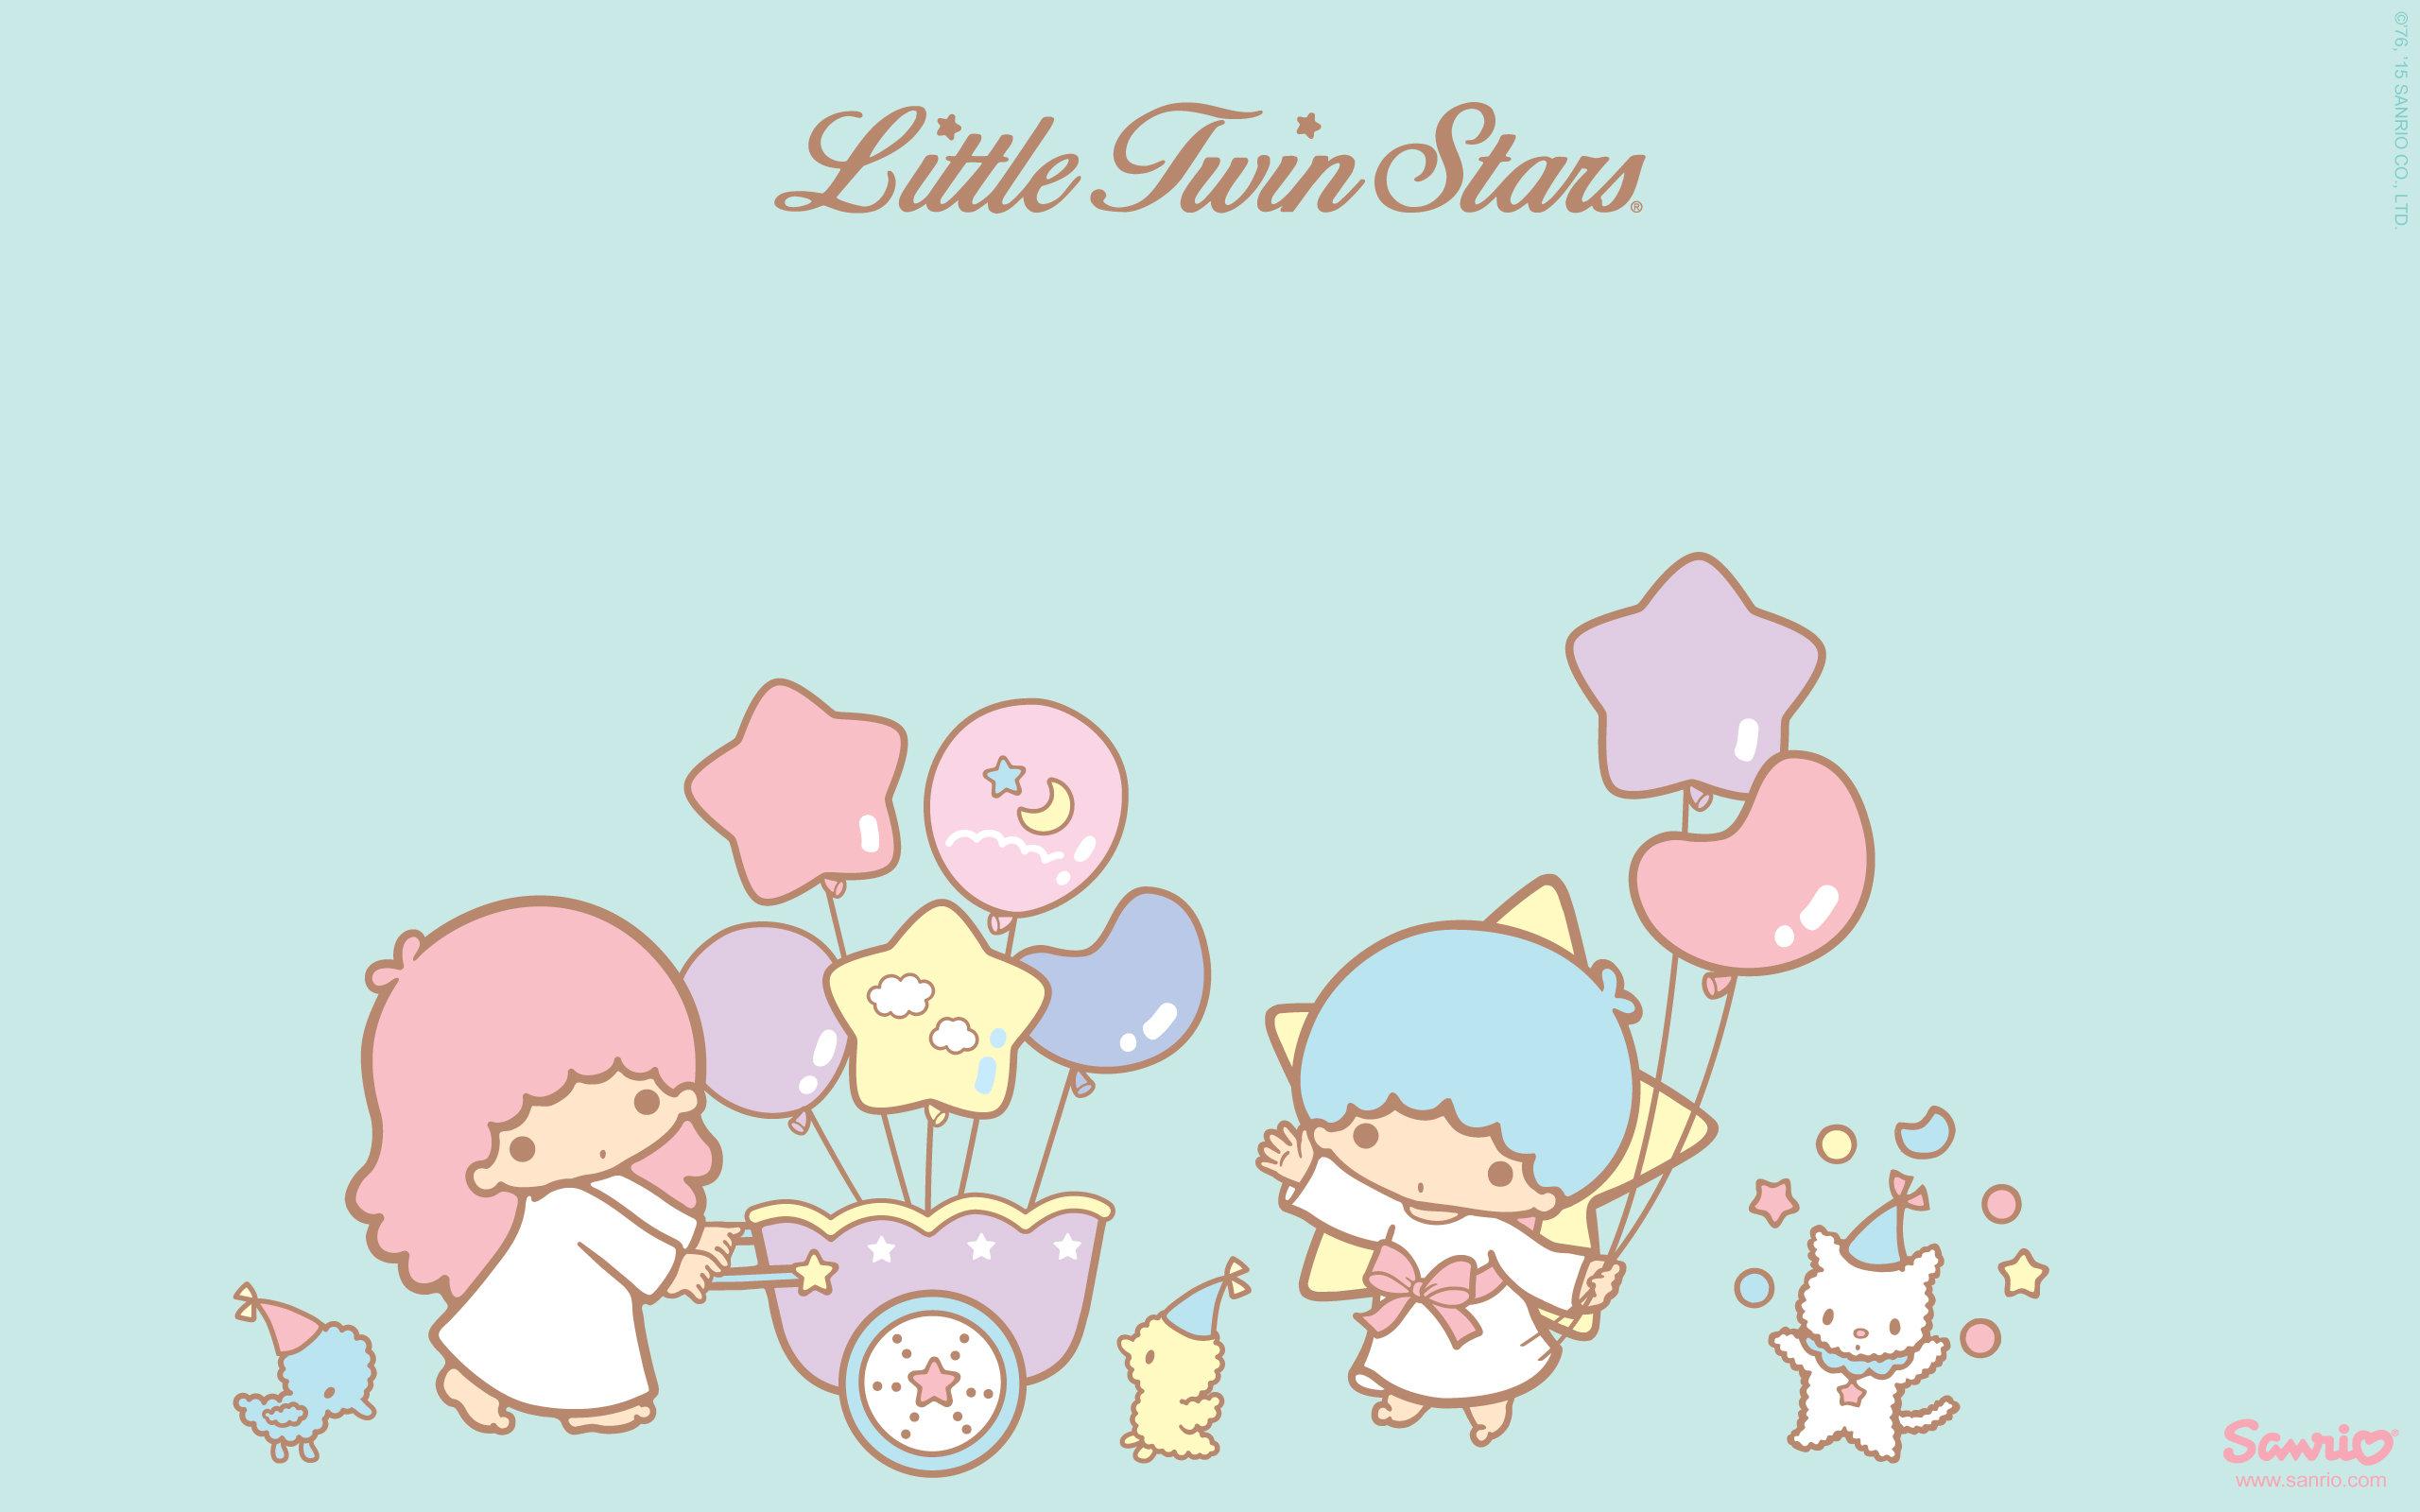 Little Twin Stars Wallpaper 2015 好康桌布 美國官方 C 款 – Stargazer Little Twin Stars Wallpaper 2013